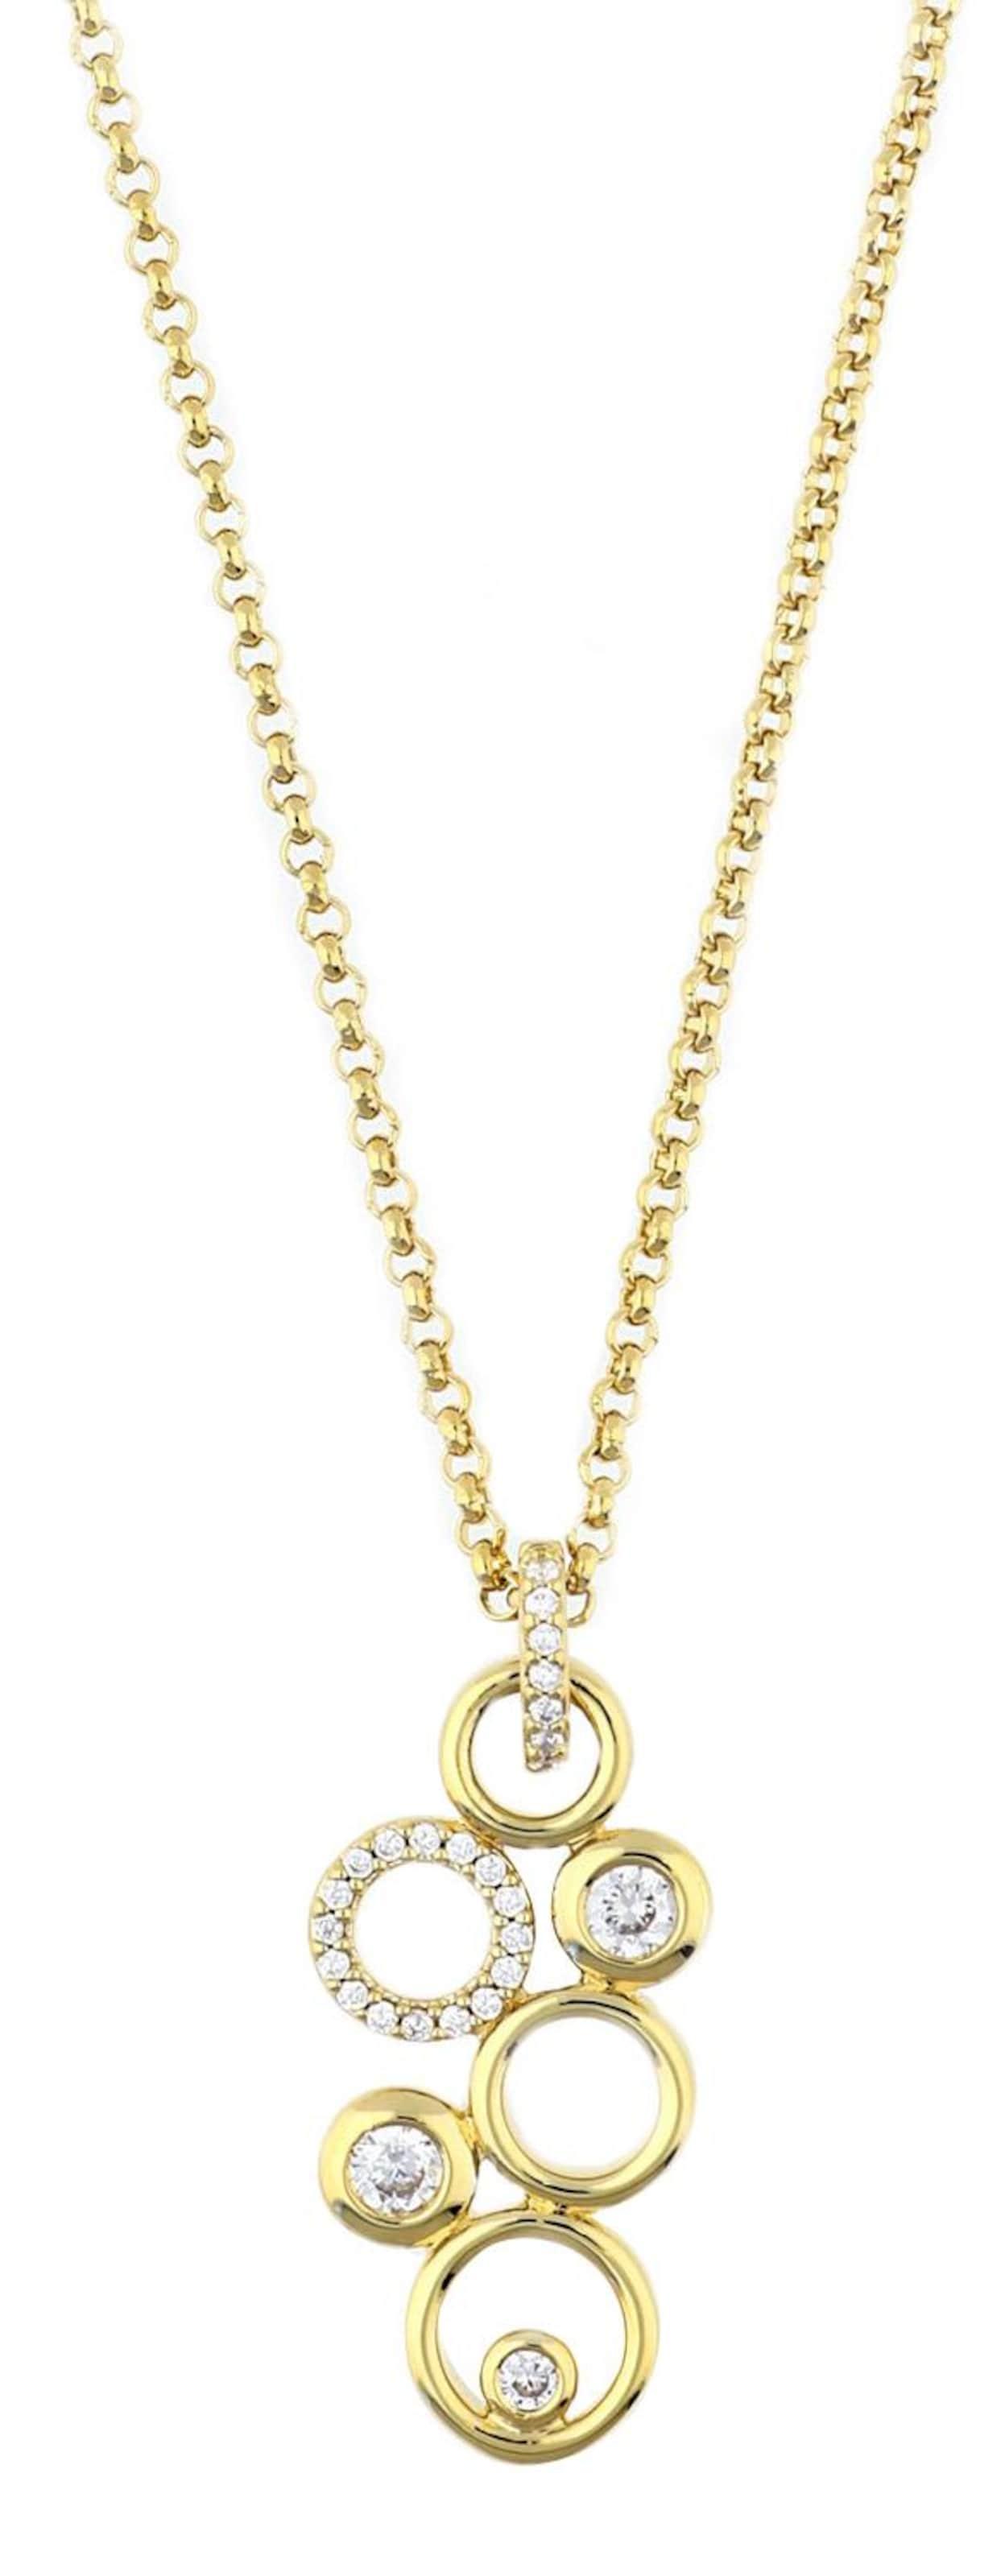 ESPRIT Halskette ESNL03410B420 Bester Ort Rabatt-Websites Spielraum Fälschung Rabatt Angebote Verkauf Sneakernews 84ITcS1b3Q